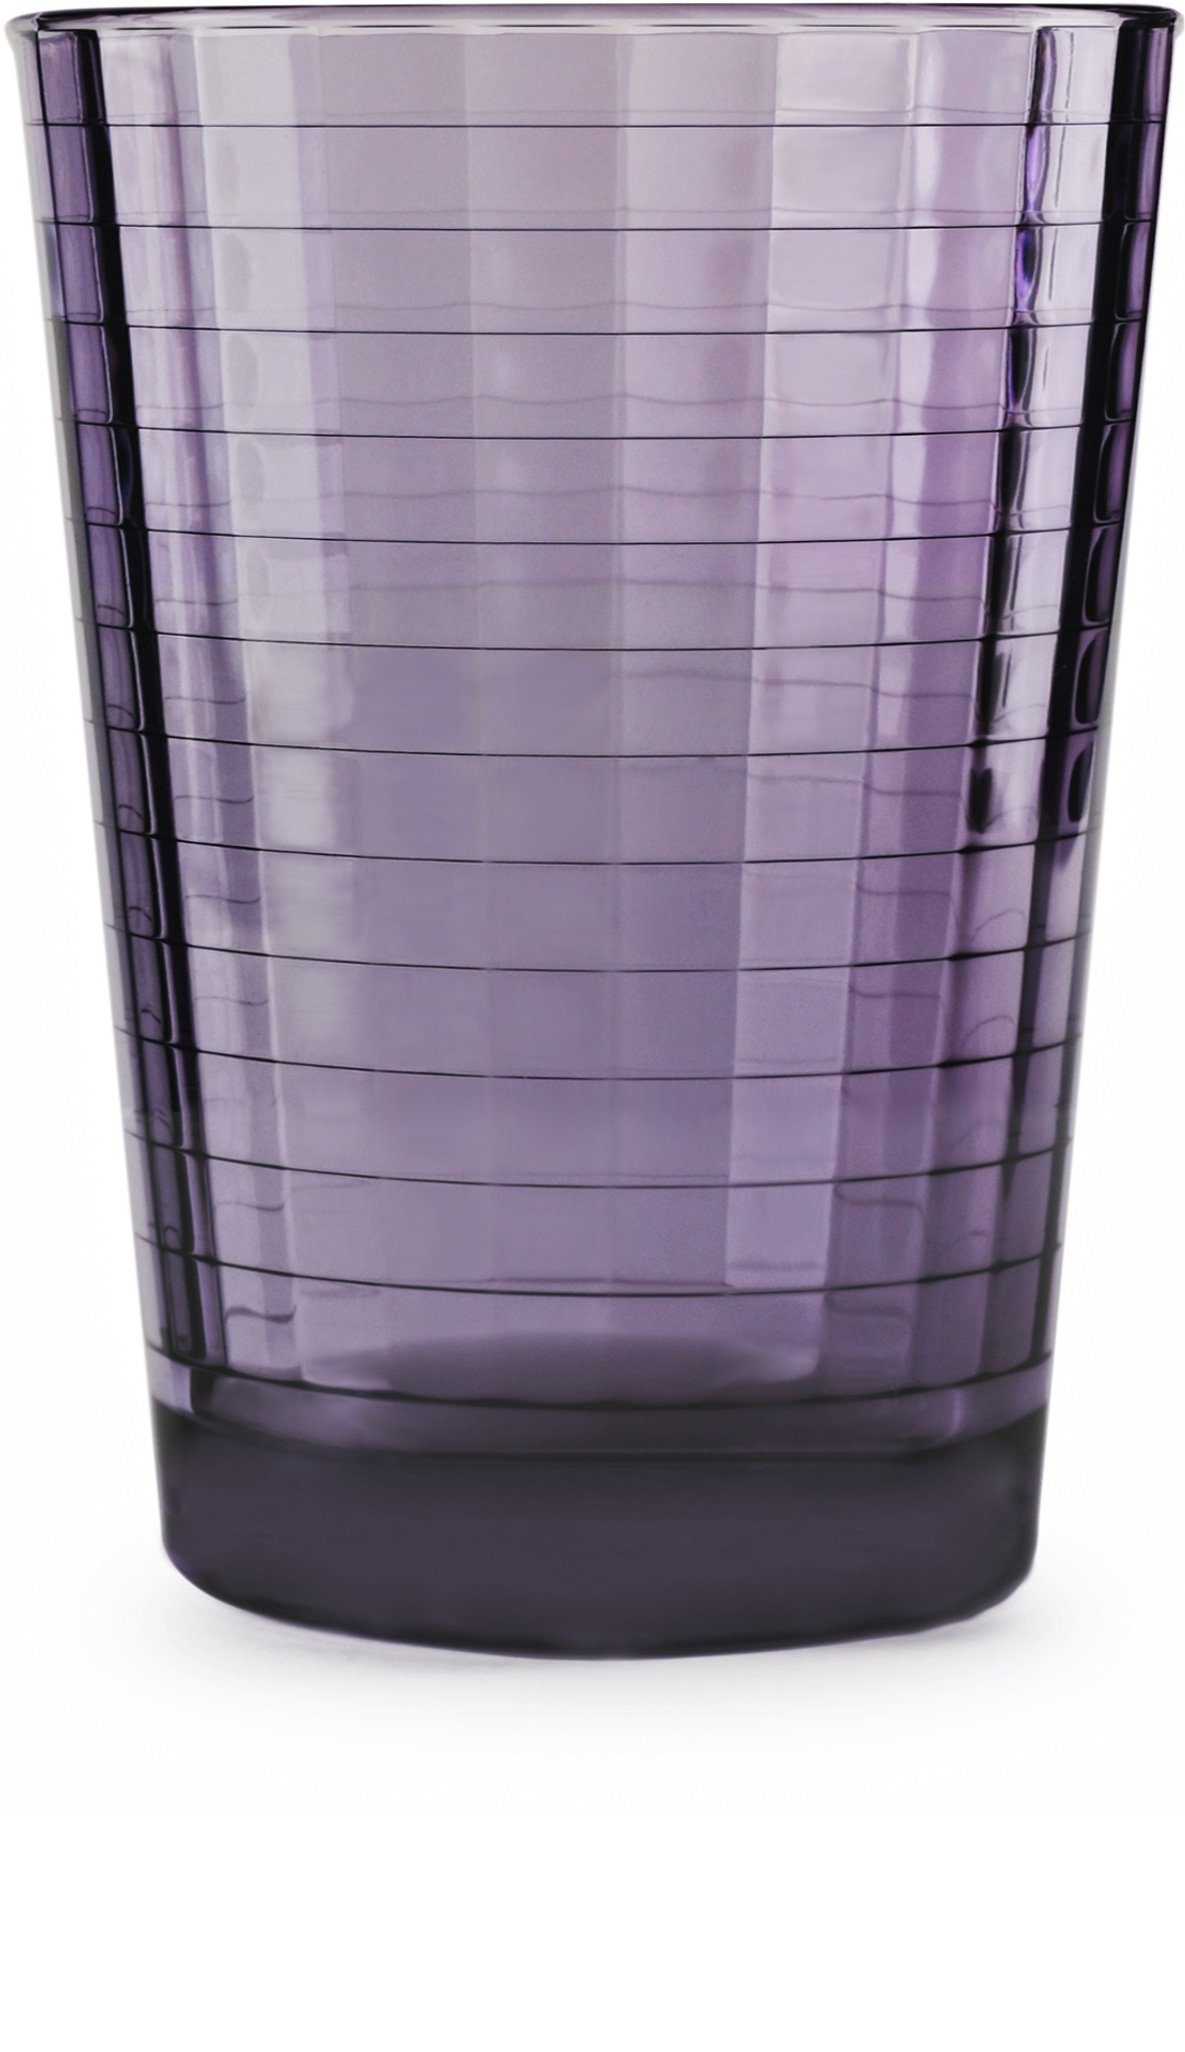 Circleware 44820 Windowpane Plum Beverage Juice Drinking Glasses, Set of 4, 7 Ounce